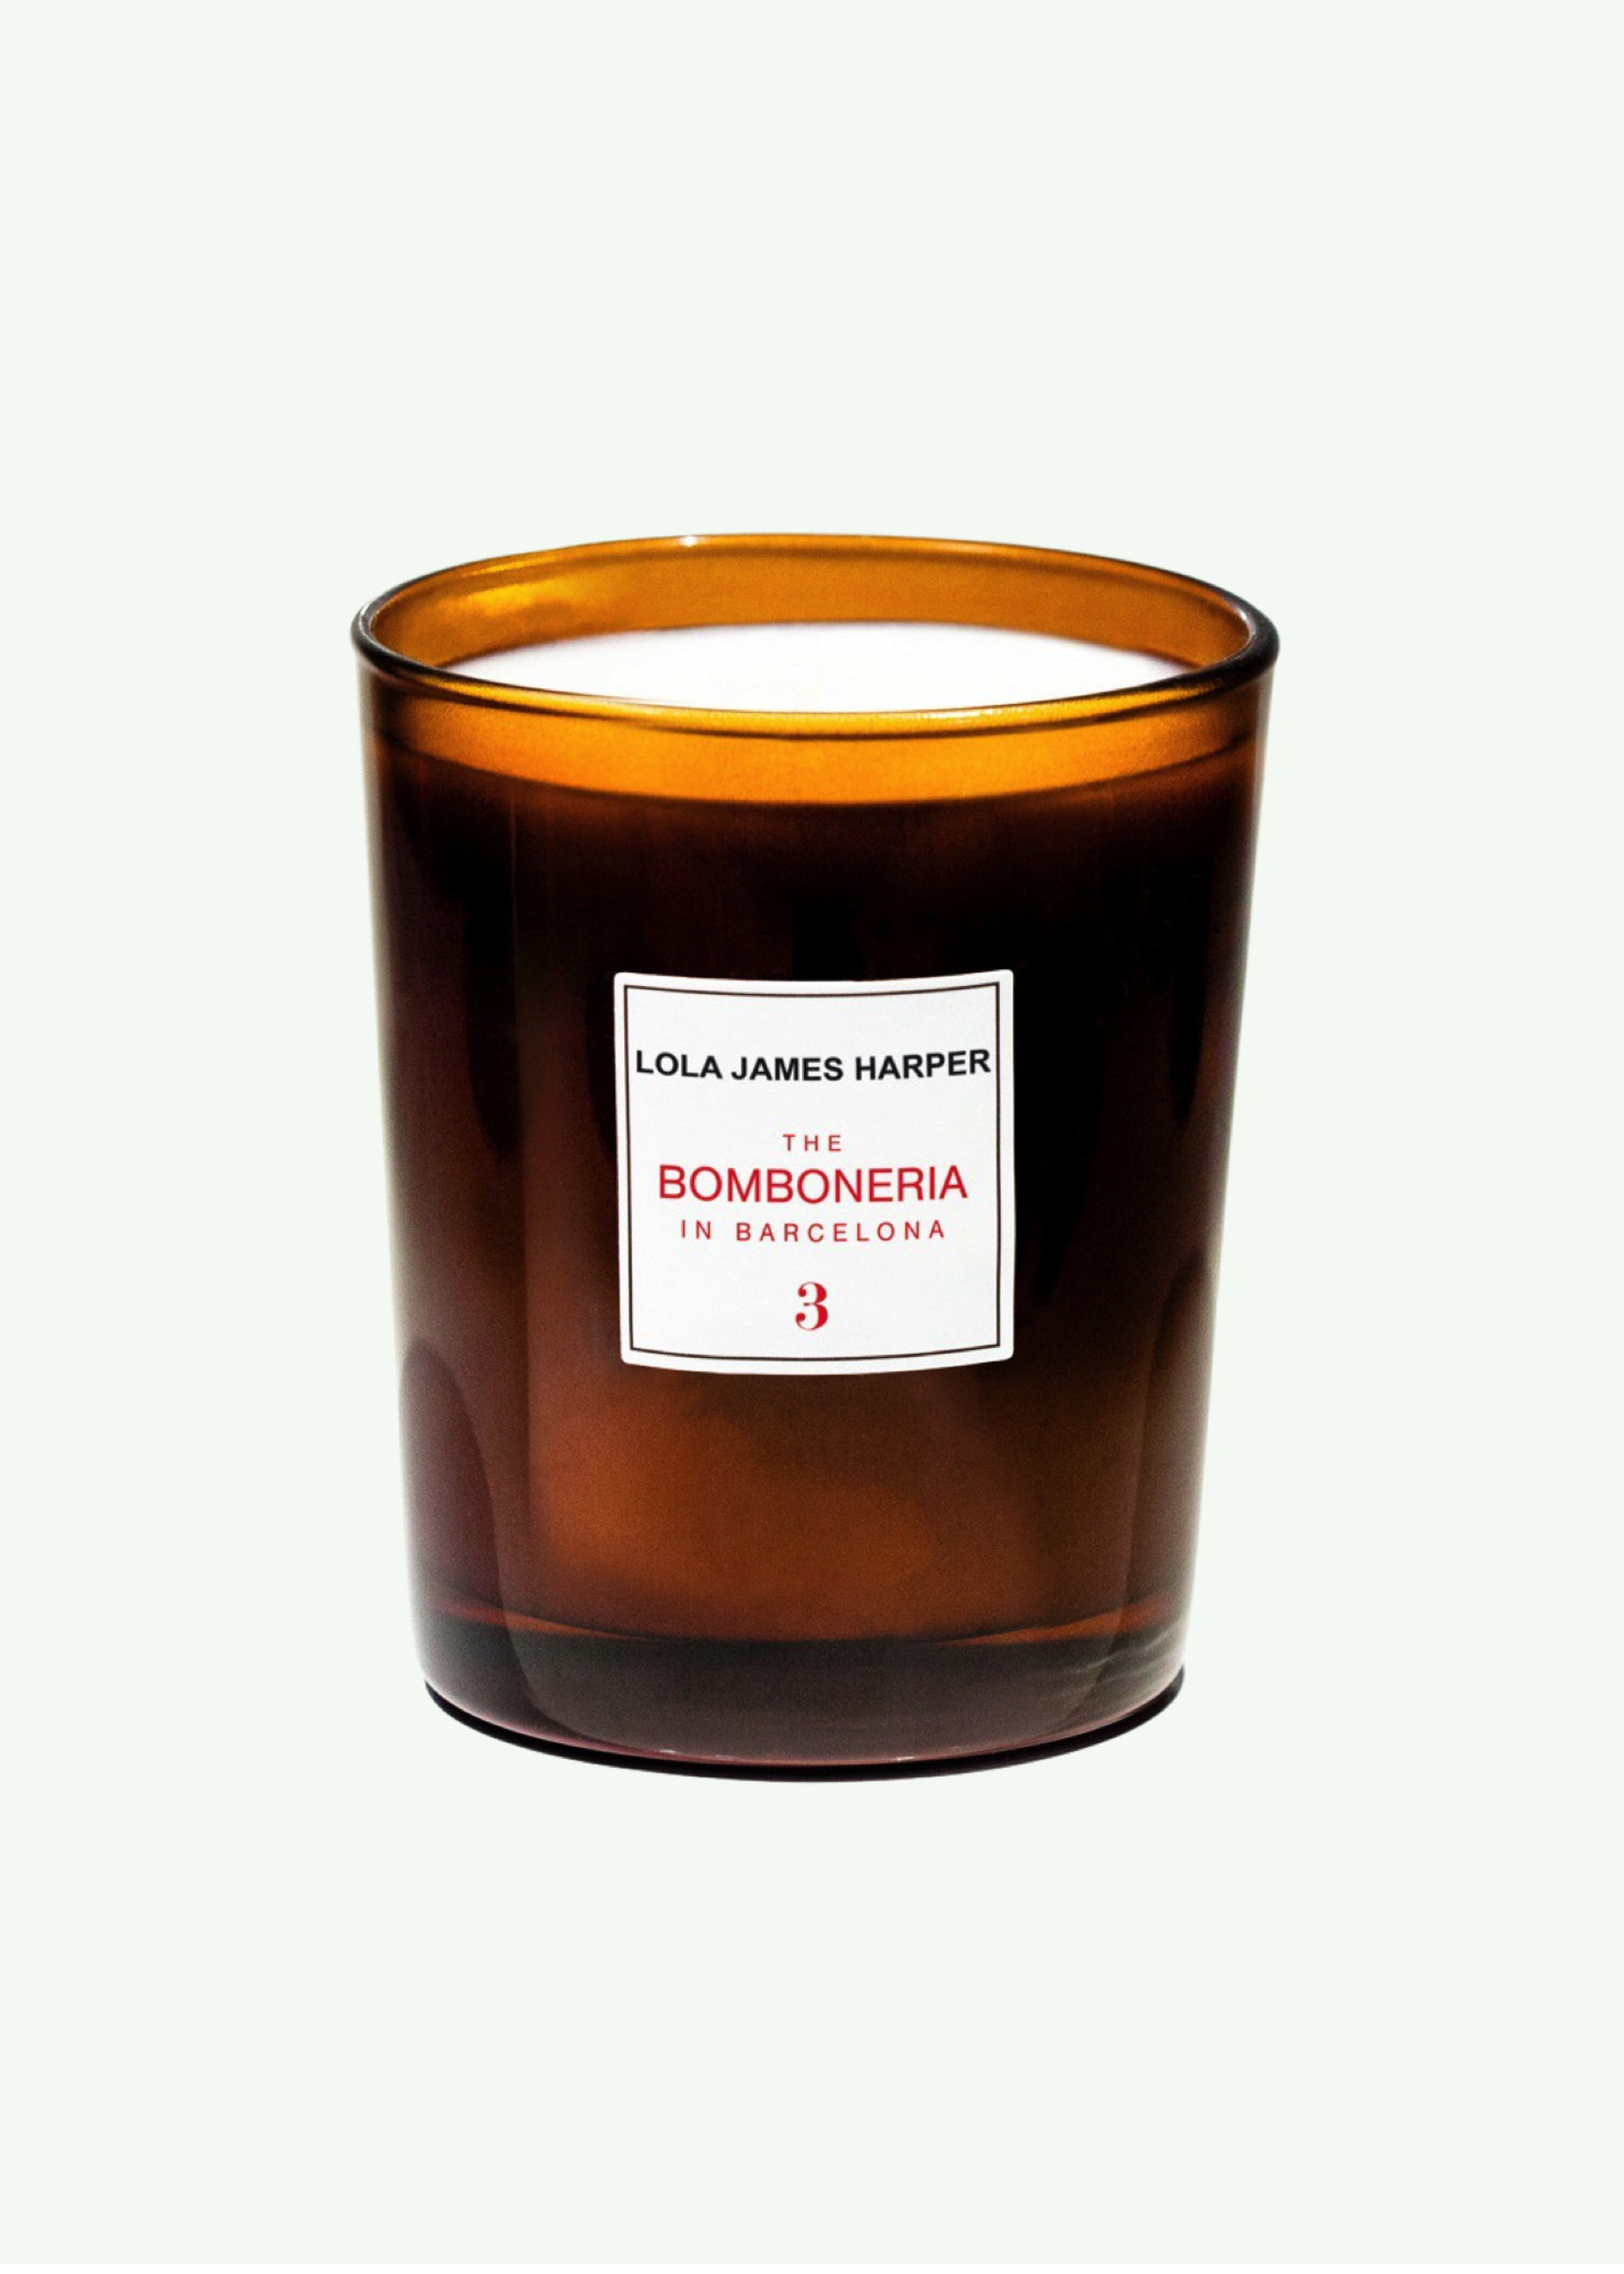 Lola James Harper Lola James Harper - The Bomboneria in Barcelona - Geurkaars 190 gr